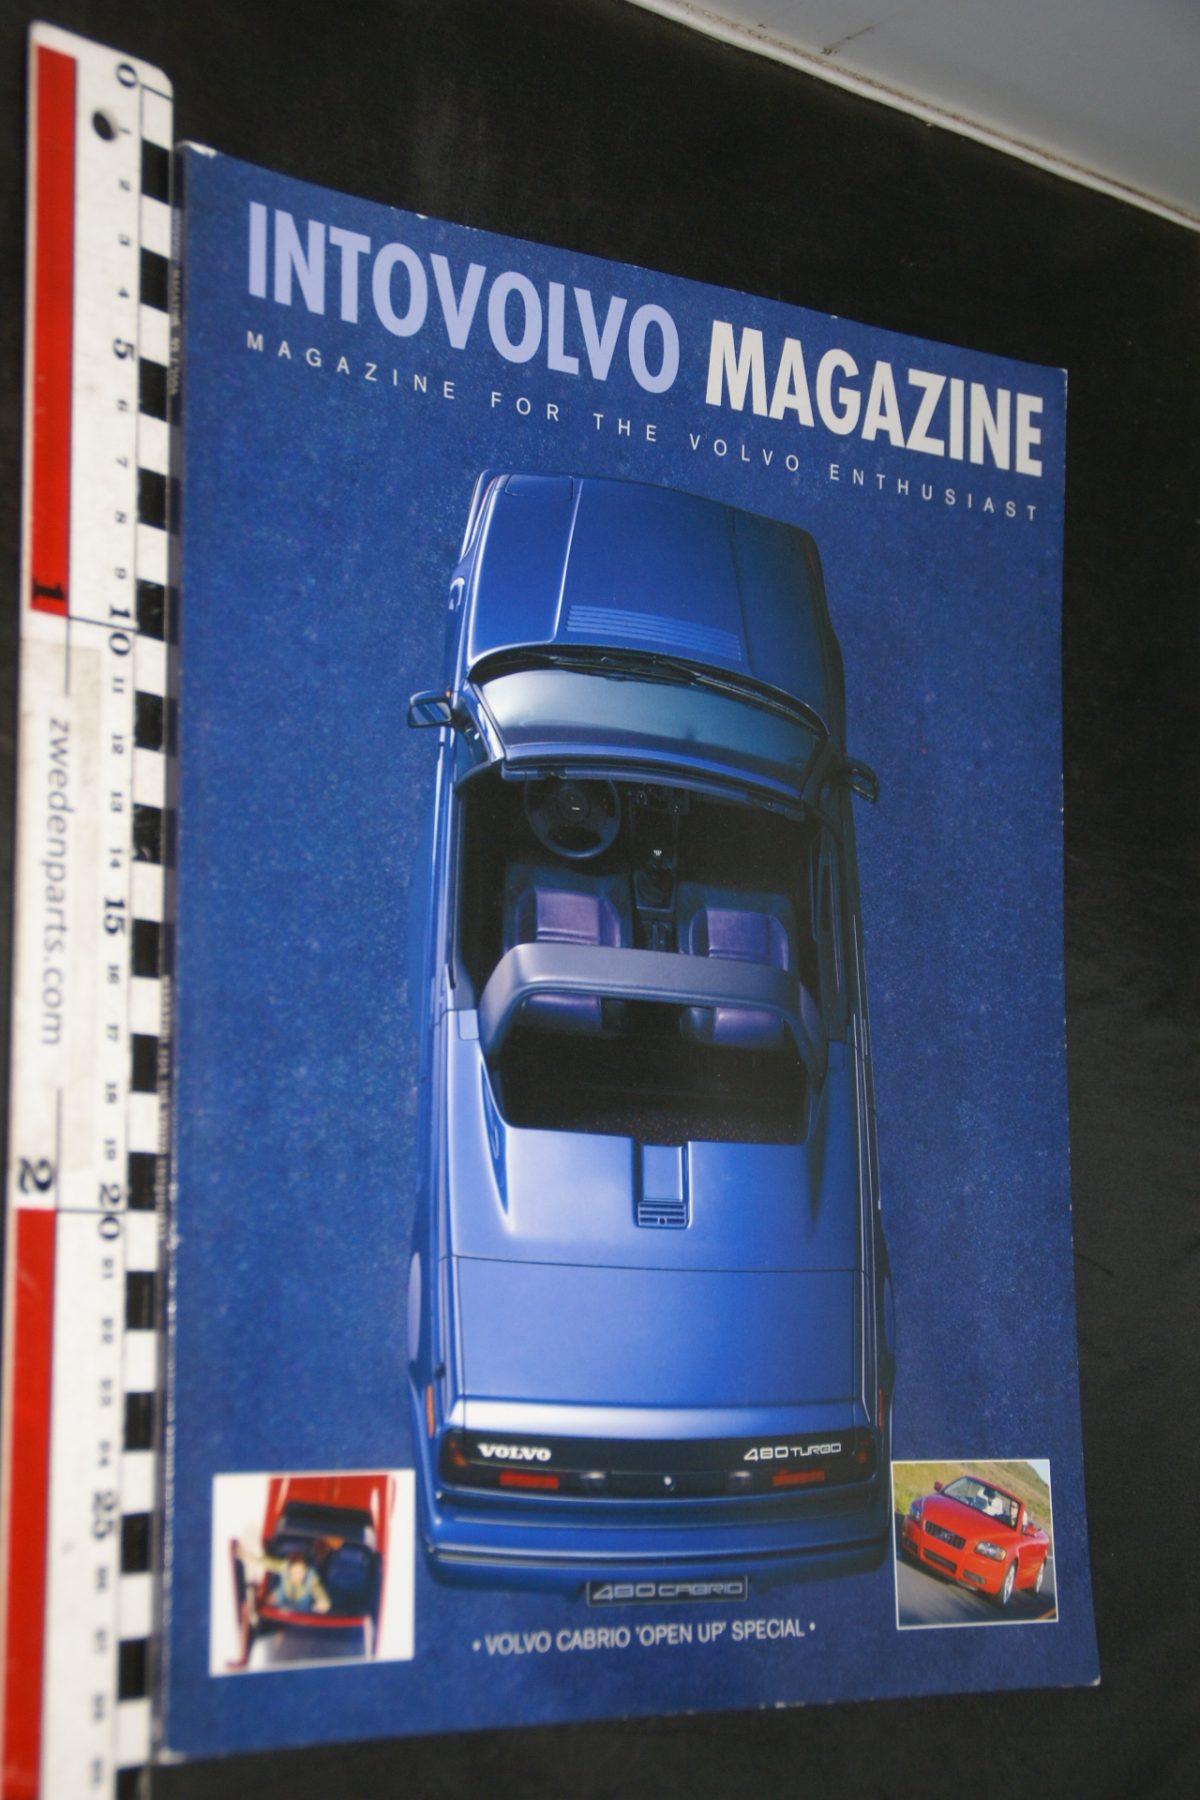 DSC05137 2006 tijdschrift Intovolvo 2006 nr 2 480 cabriolet